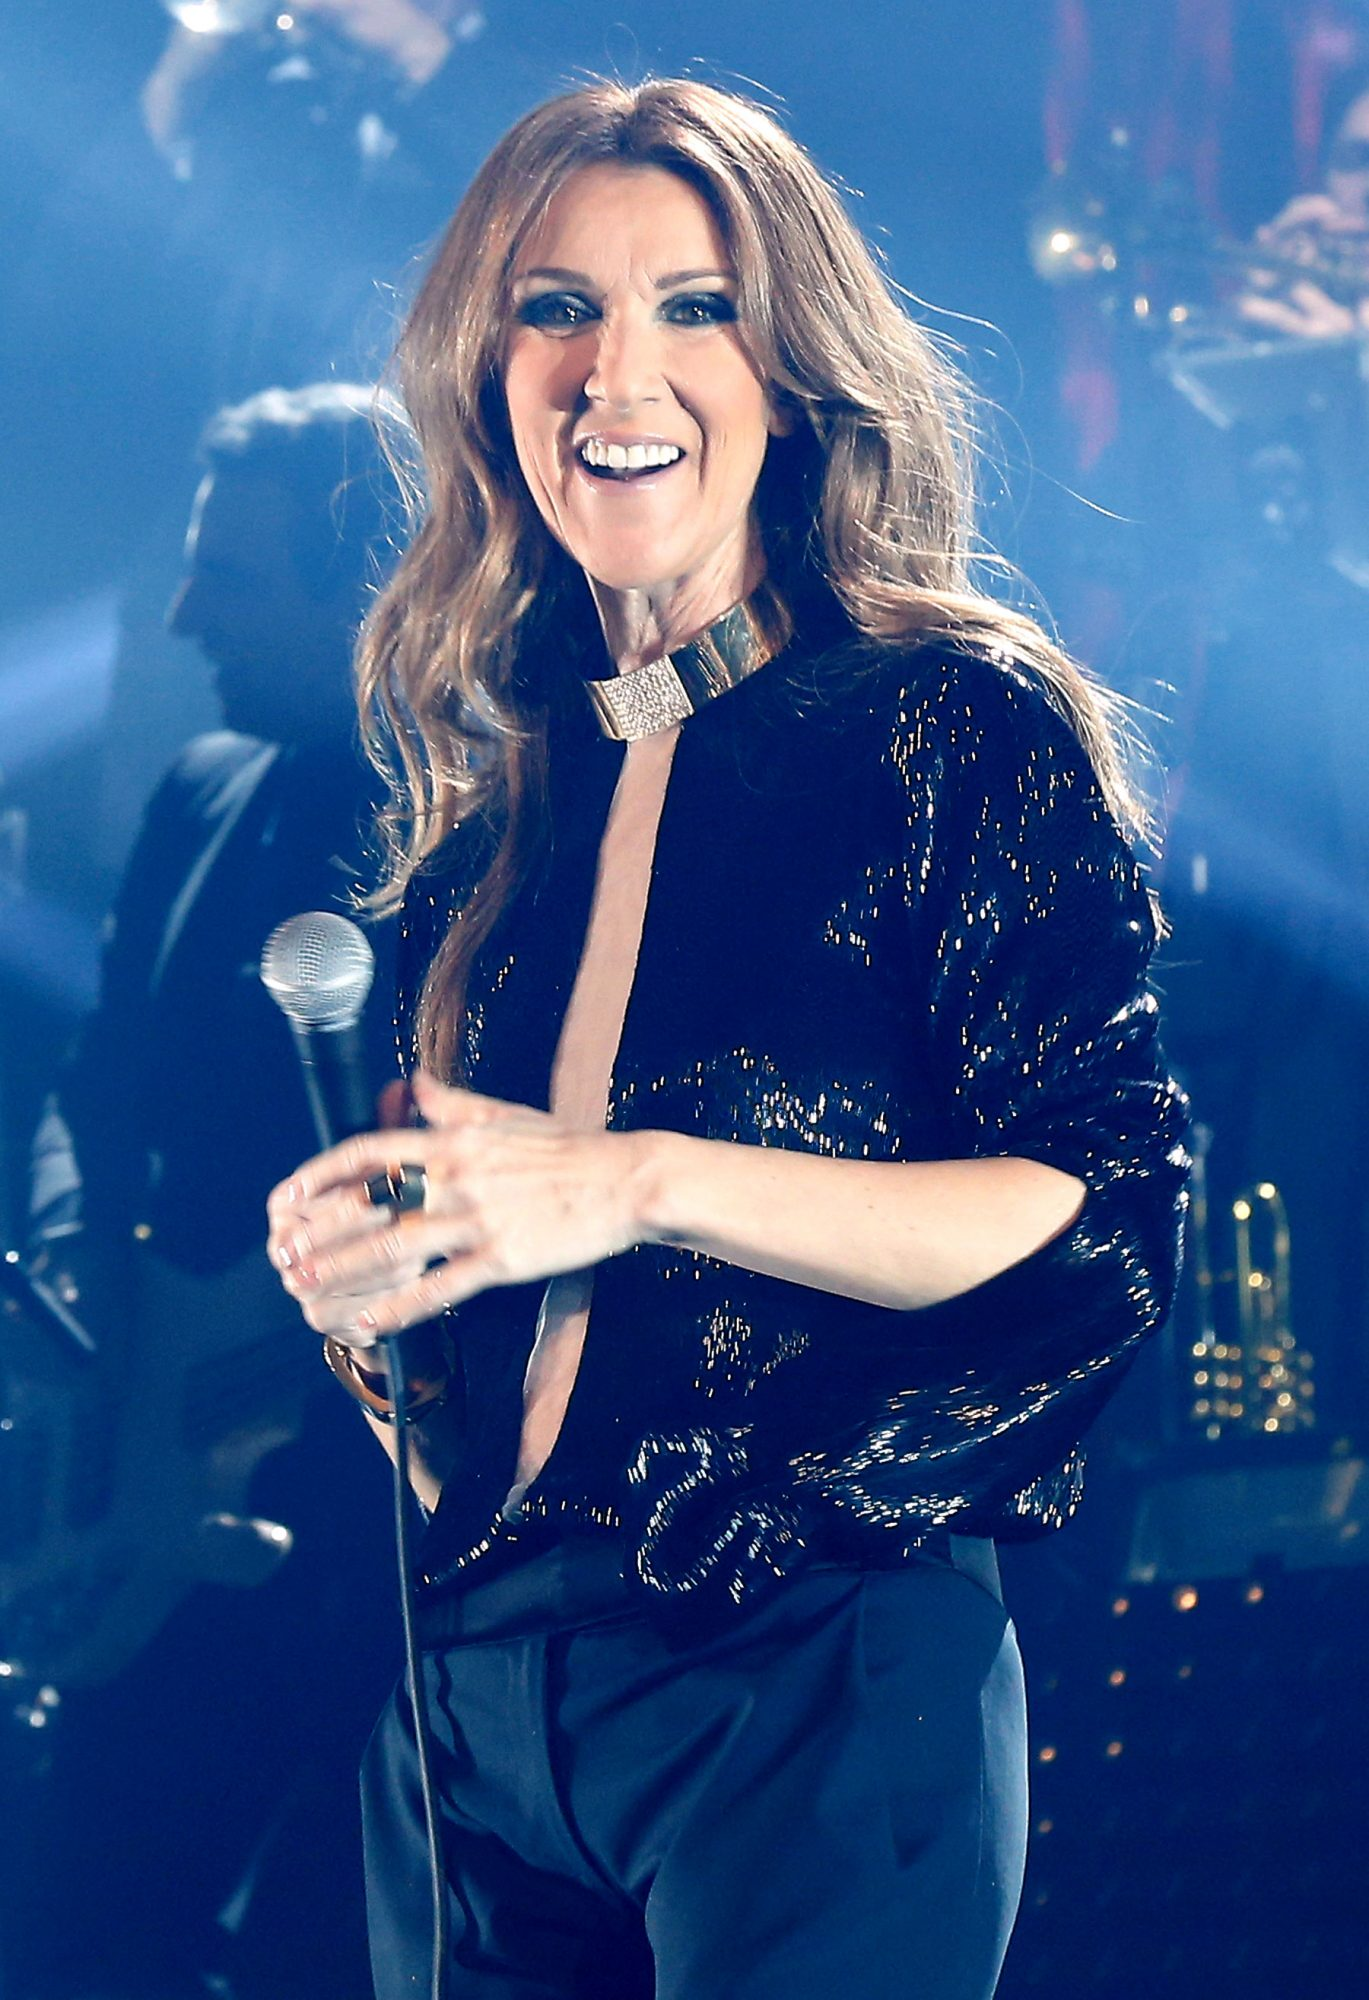 Celine Dion In Concert AT Palais Omnisport De Paris Bercy